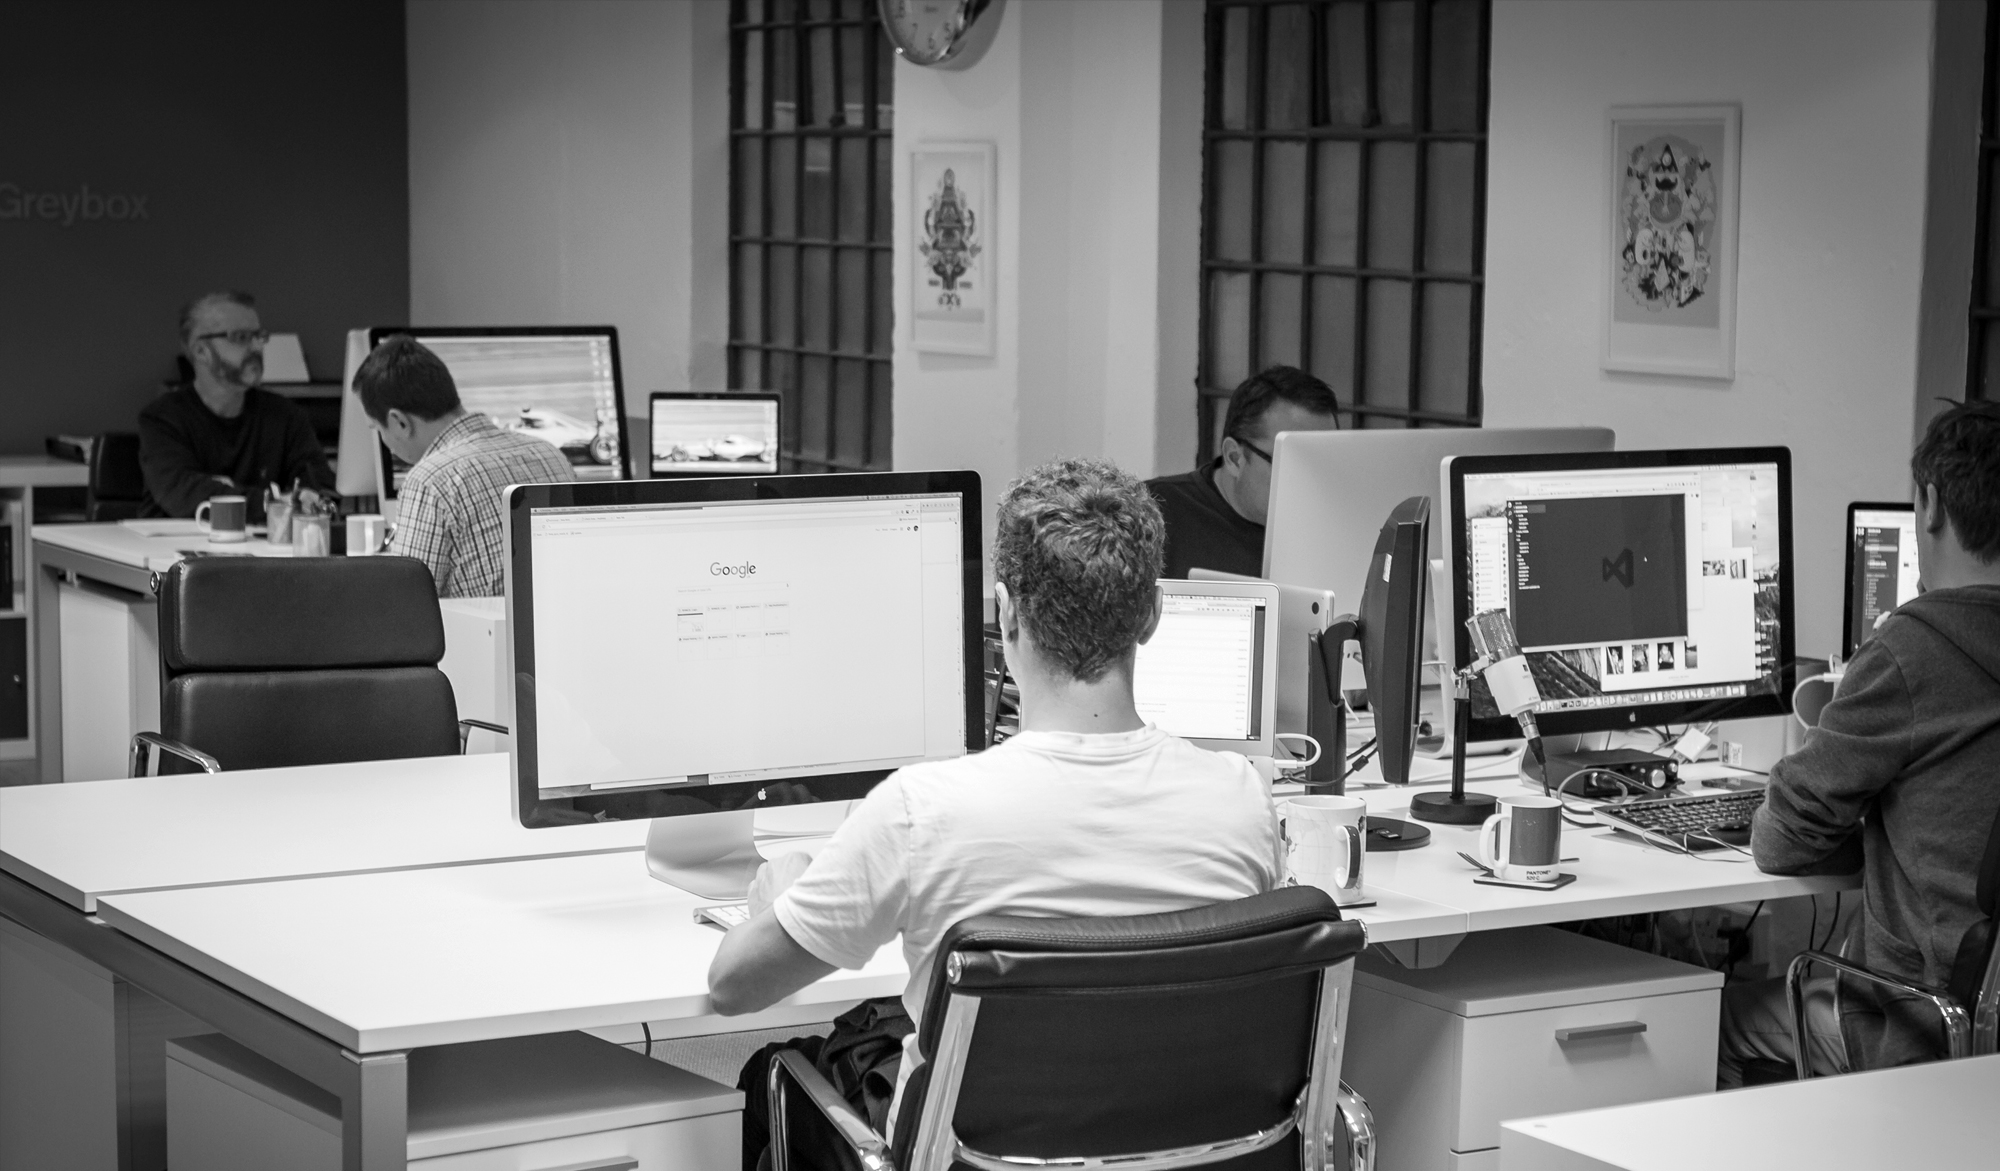 Greybox Creative studio team